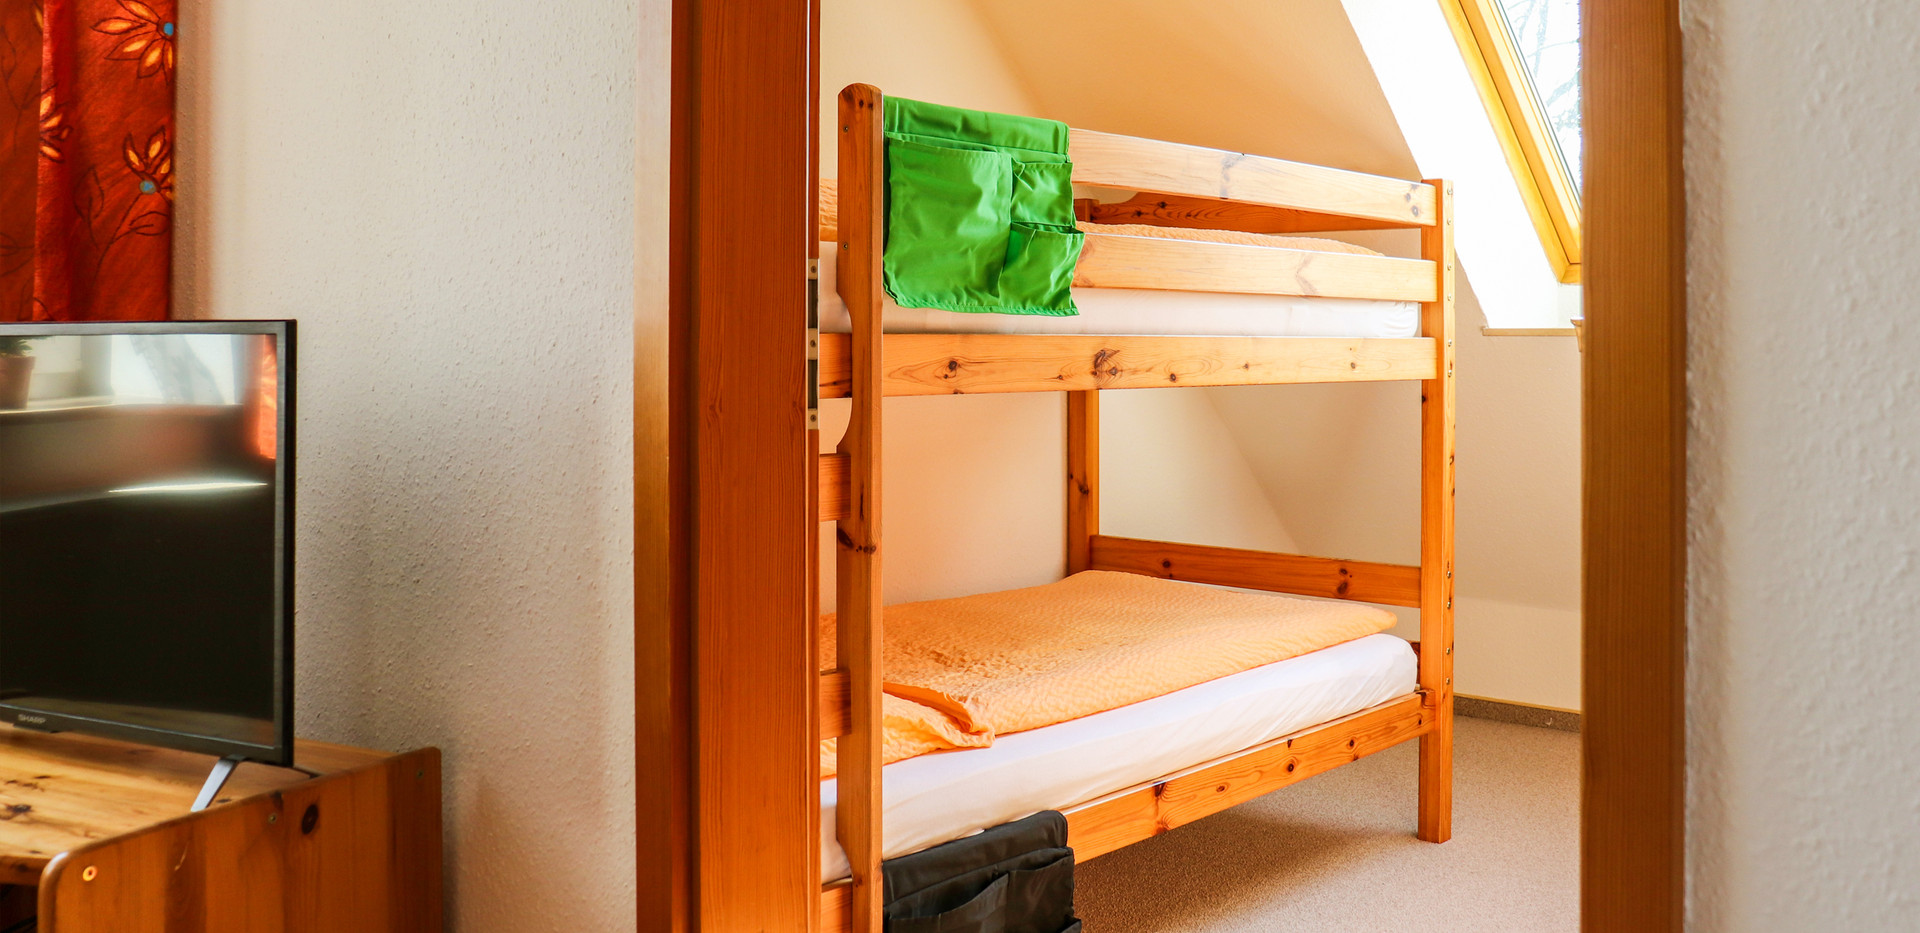 Dennhornshof Wohnung 2